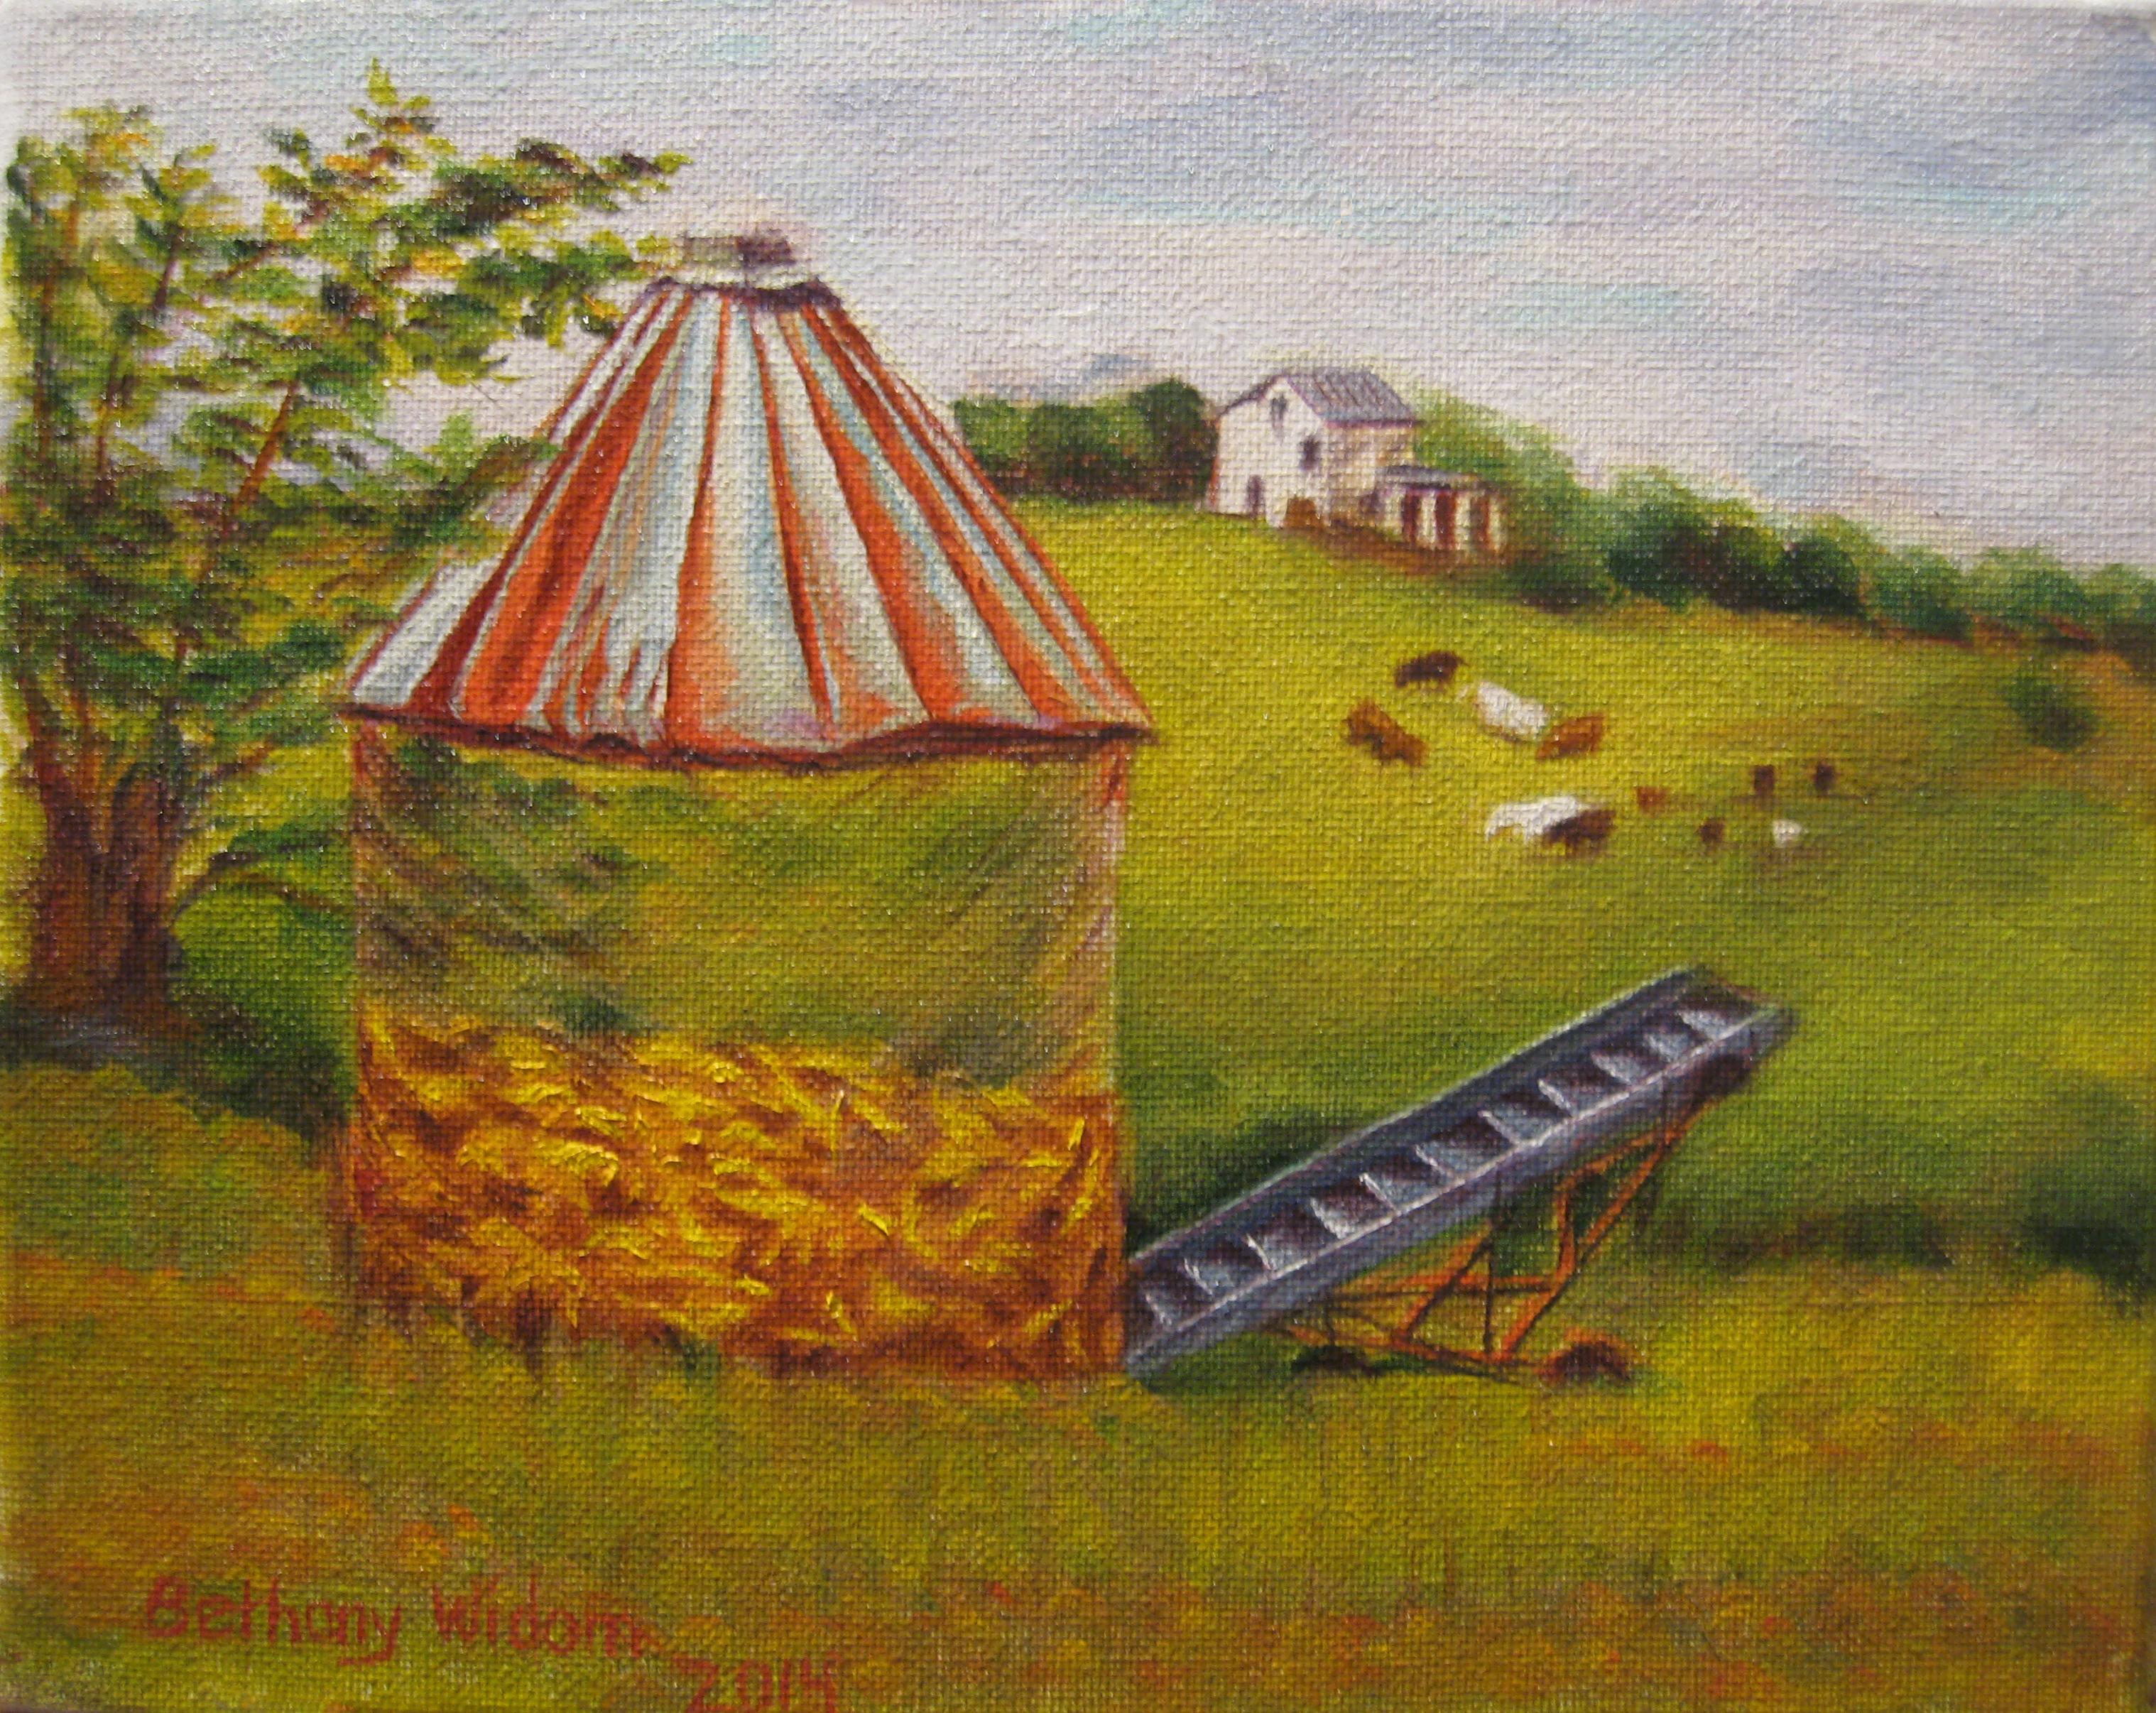 Corn Crib Talbot Farm 8x10